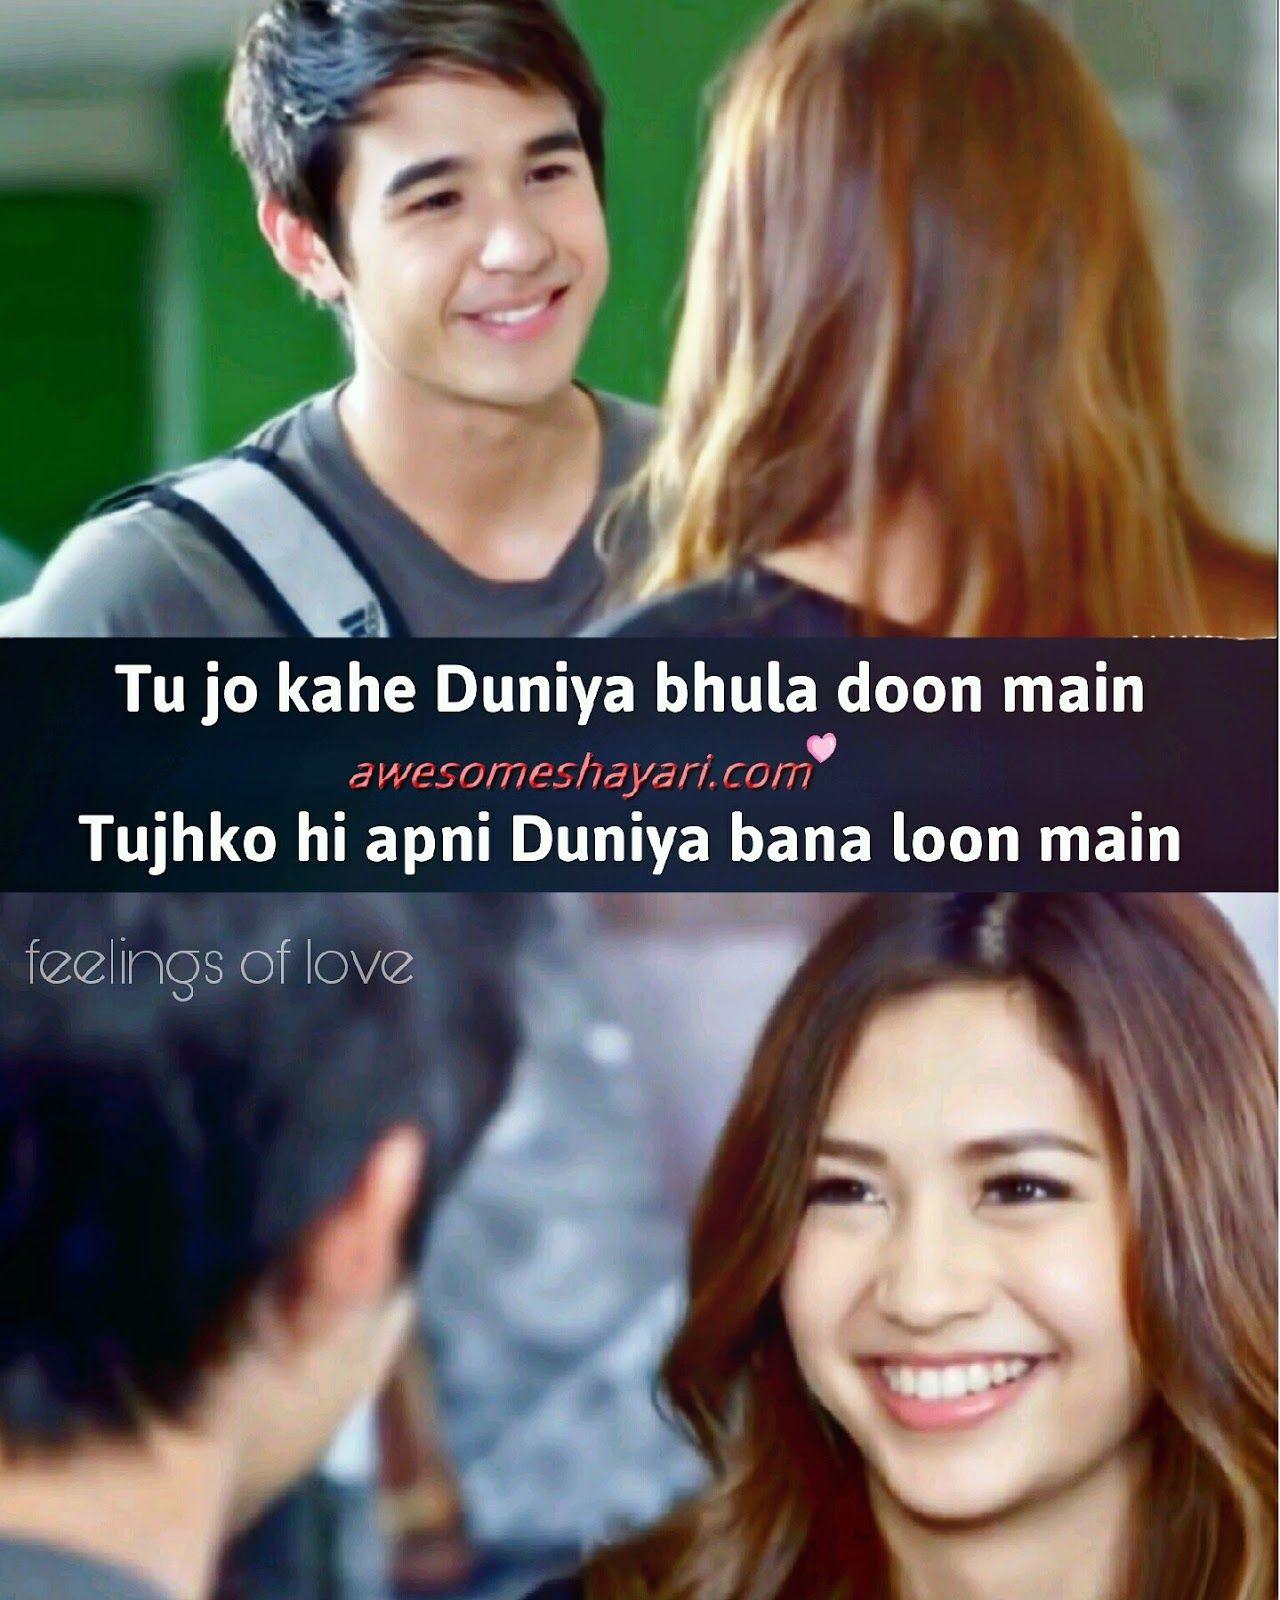 Full Song Mai Wo Dunya Mp3 Download: Tu Jo Kahe Lyrics T